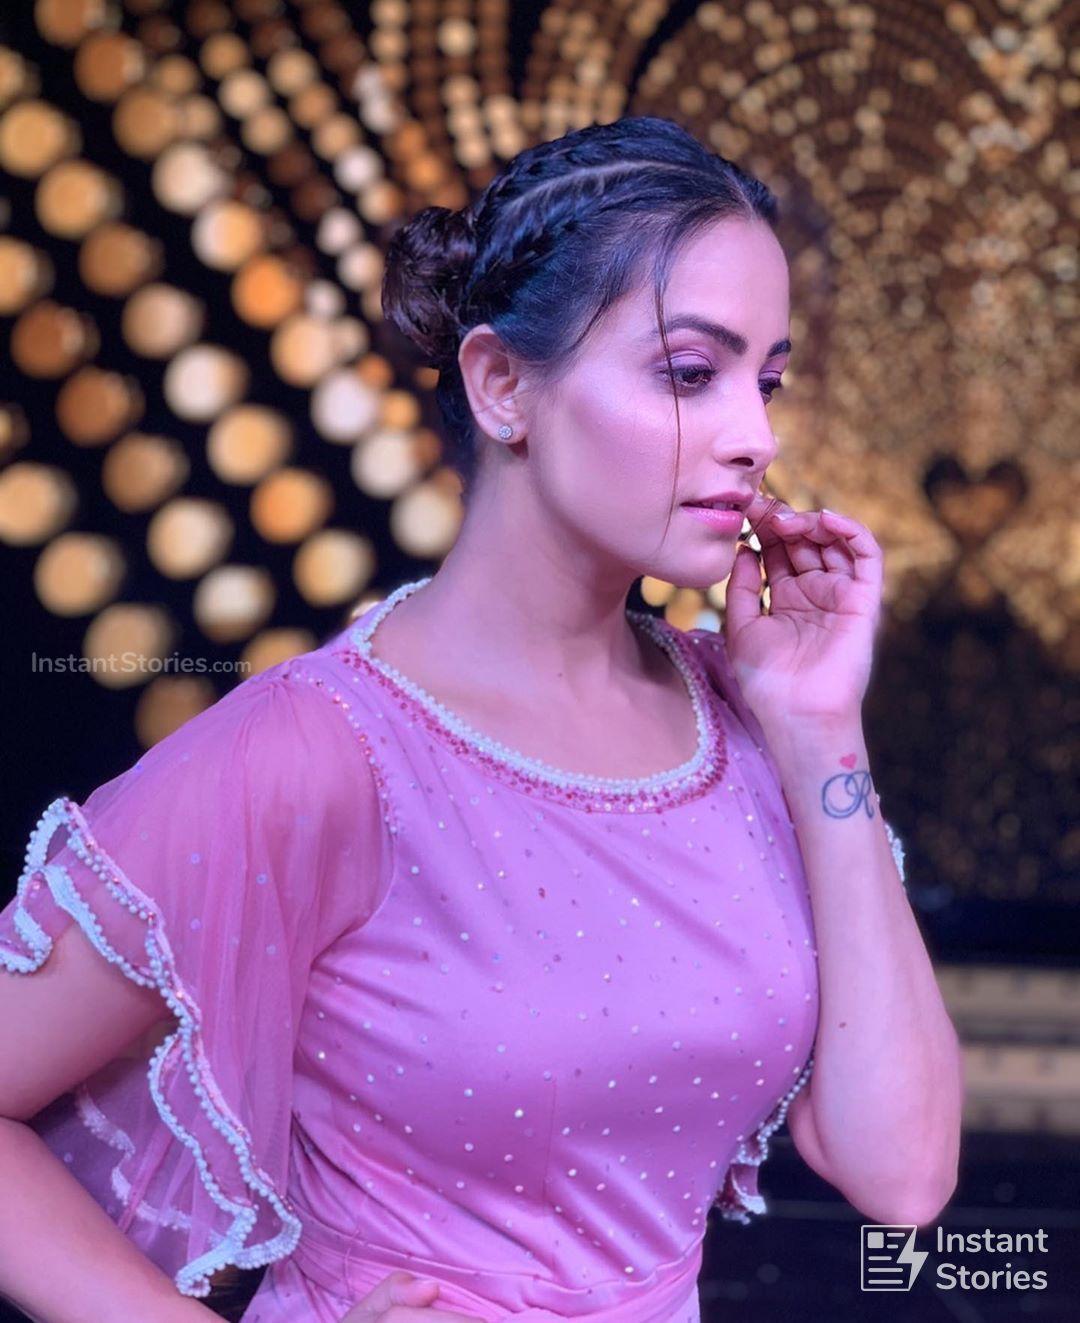 Anita Hassanandani Latest Hot Hd Photos Wallpapers 1080p Most Beautiful Indian Actress Beautiful Indian Actress South Indian Actress Photo